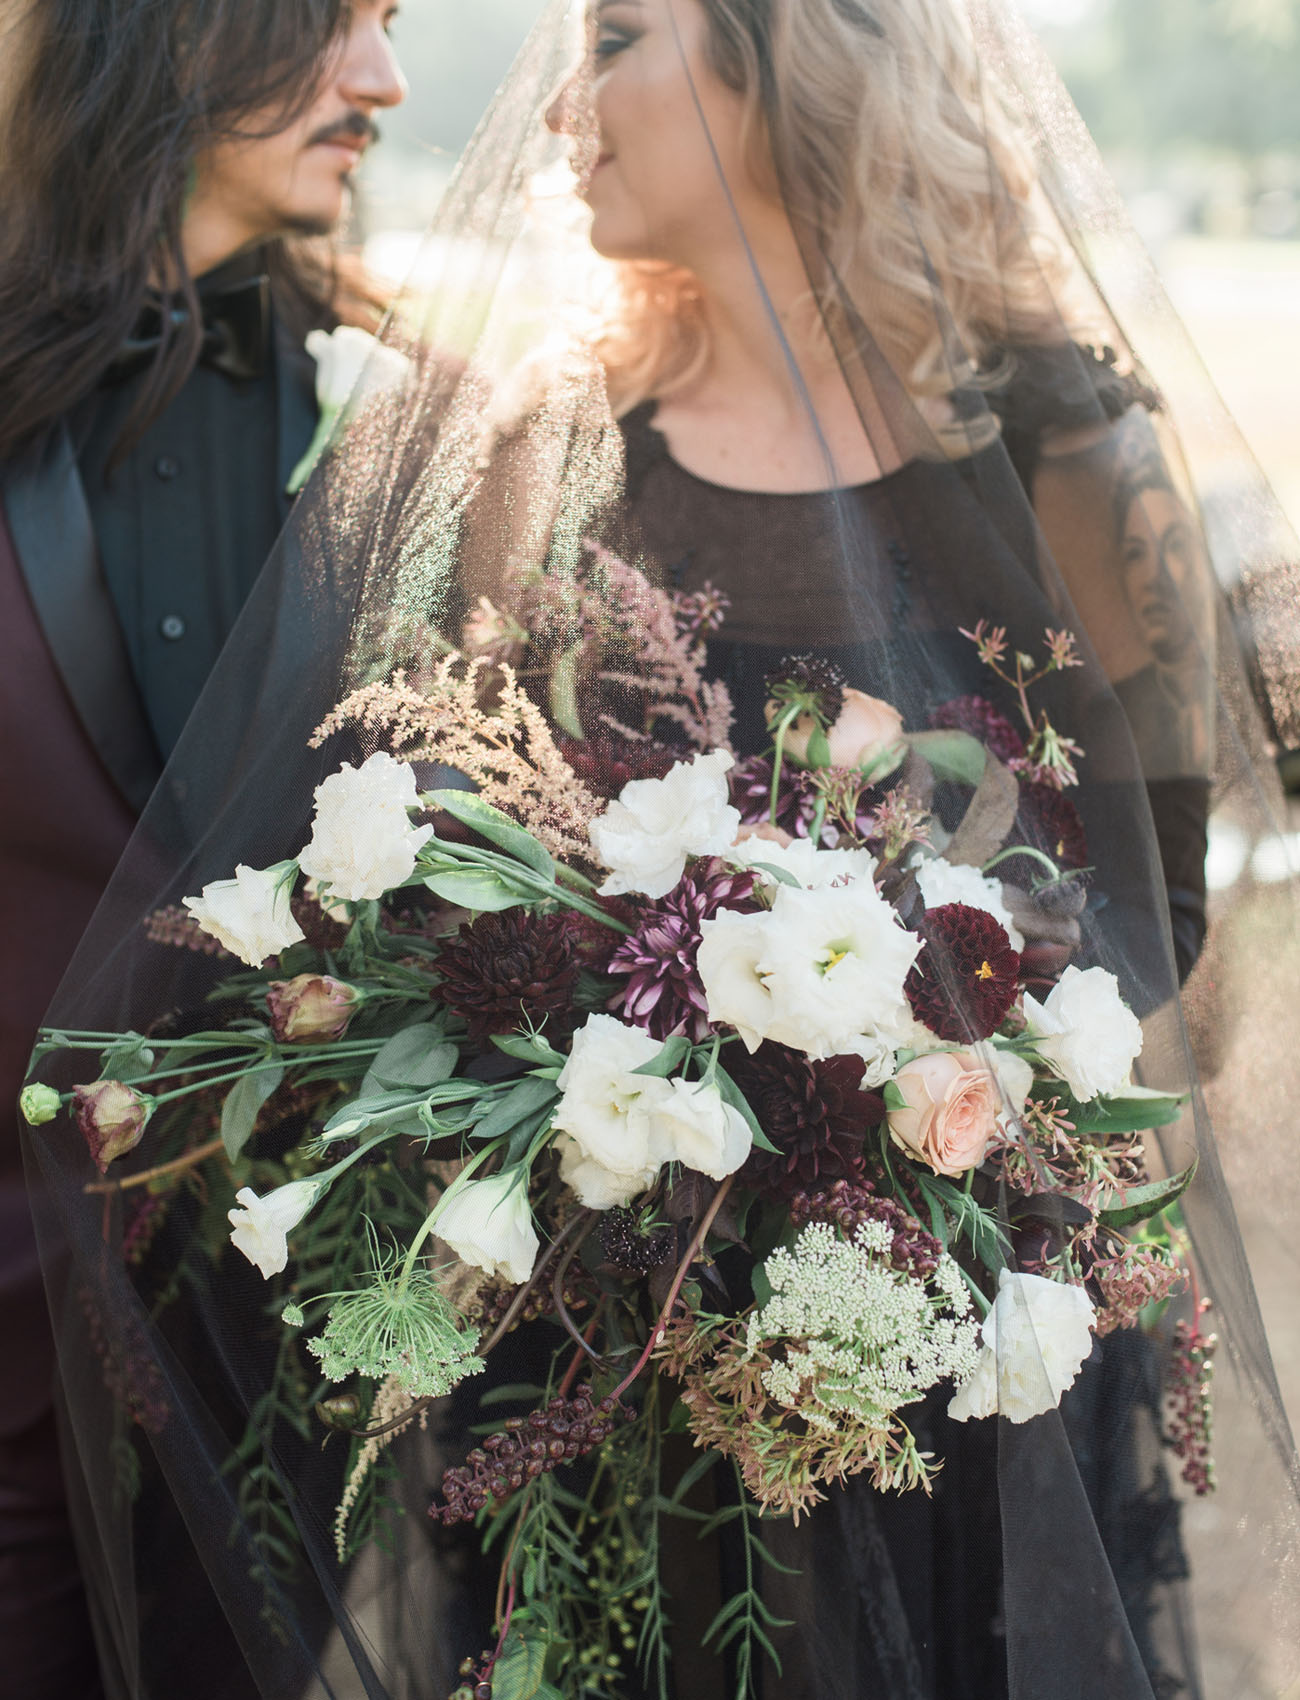 spooky bouquet